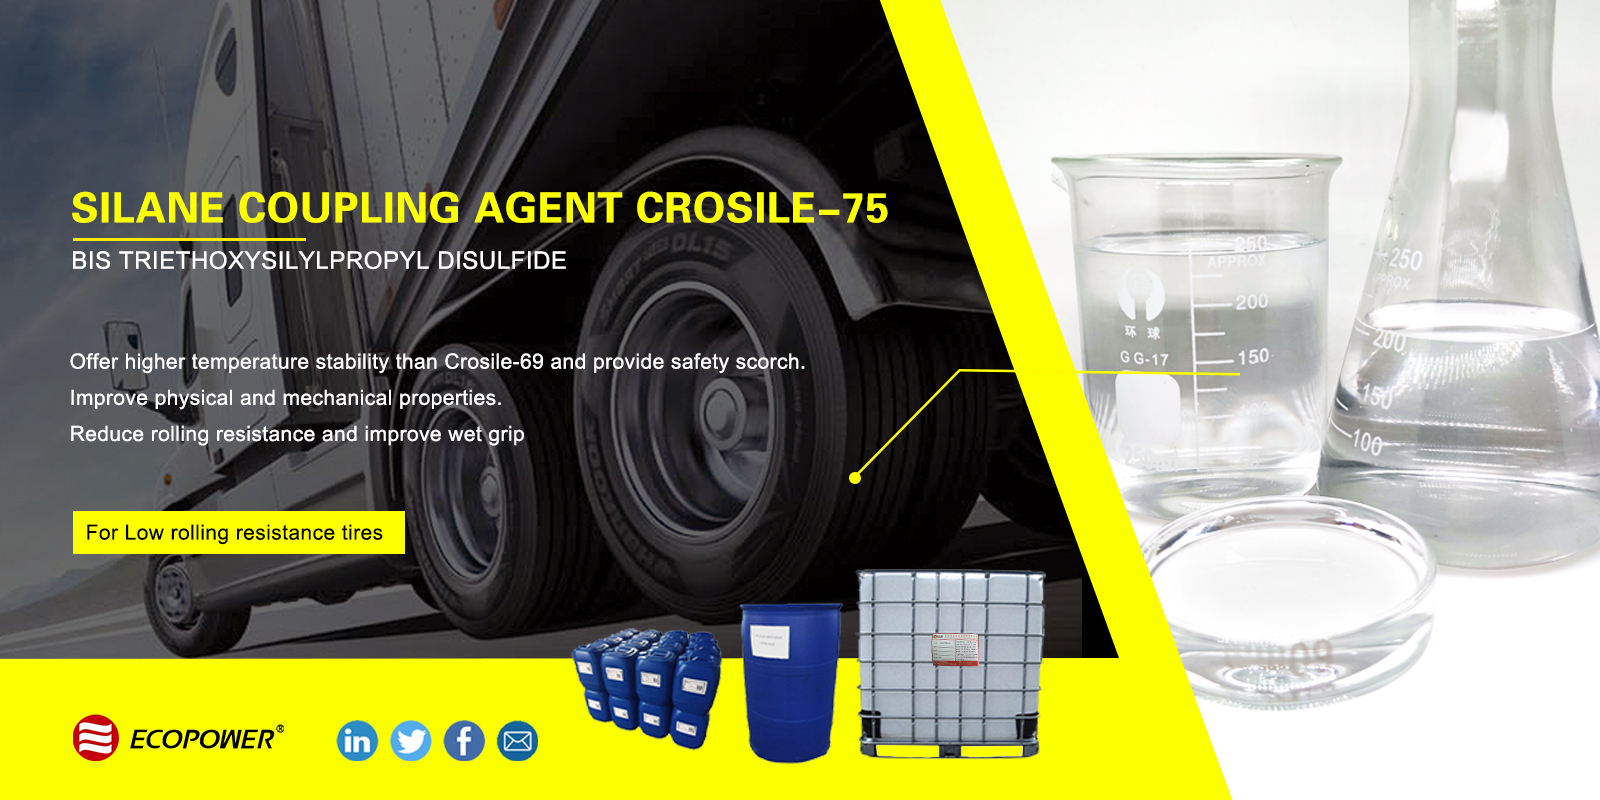 Bis Triethoxysilylpropyl Disulfide Crosile -75